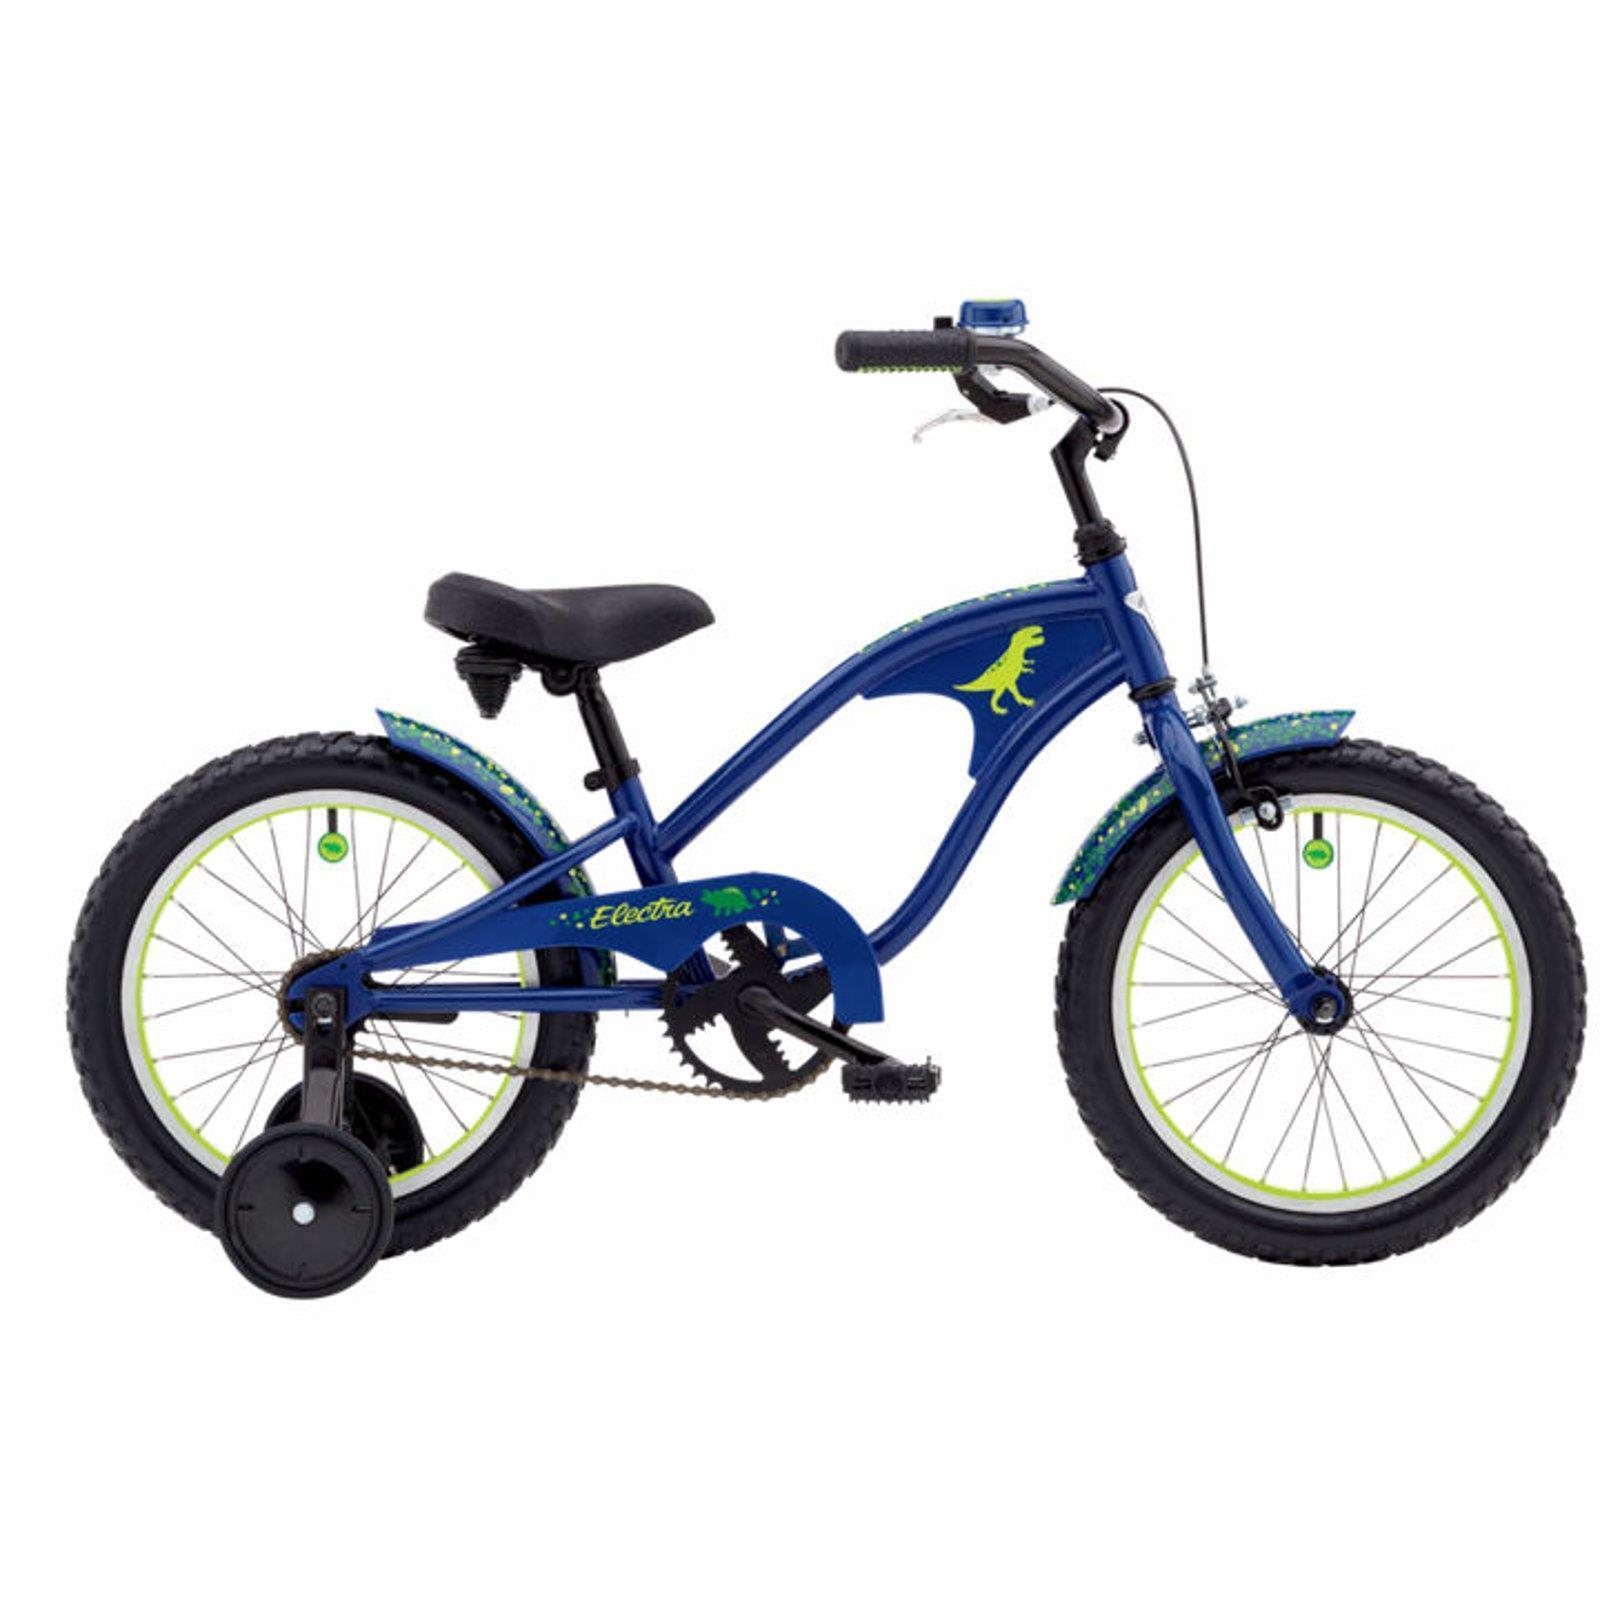 Electra 16 Zoll Kinder Fahrrad Stützräder Jungen T-Rex Kids Dinosaurier Dino WOW